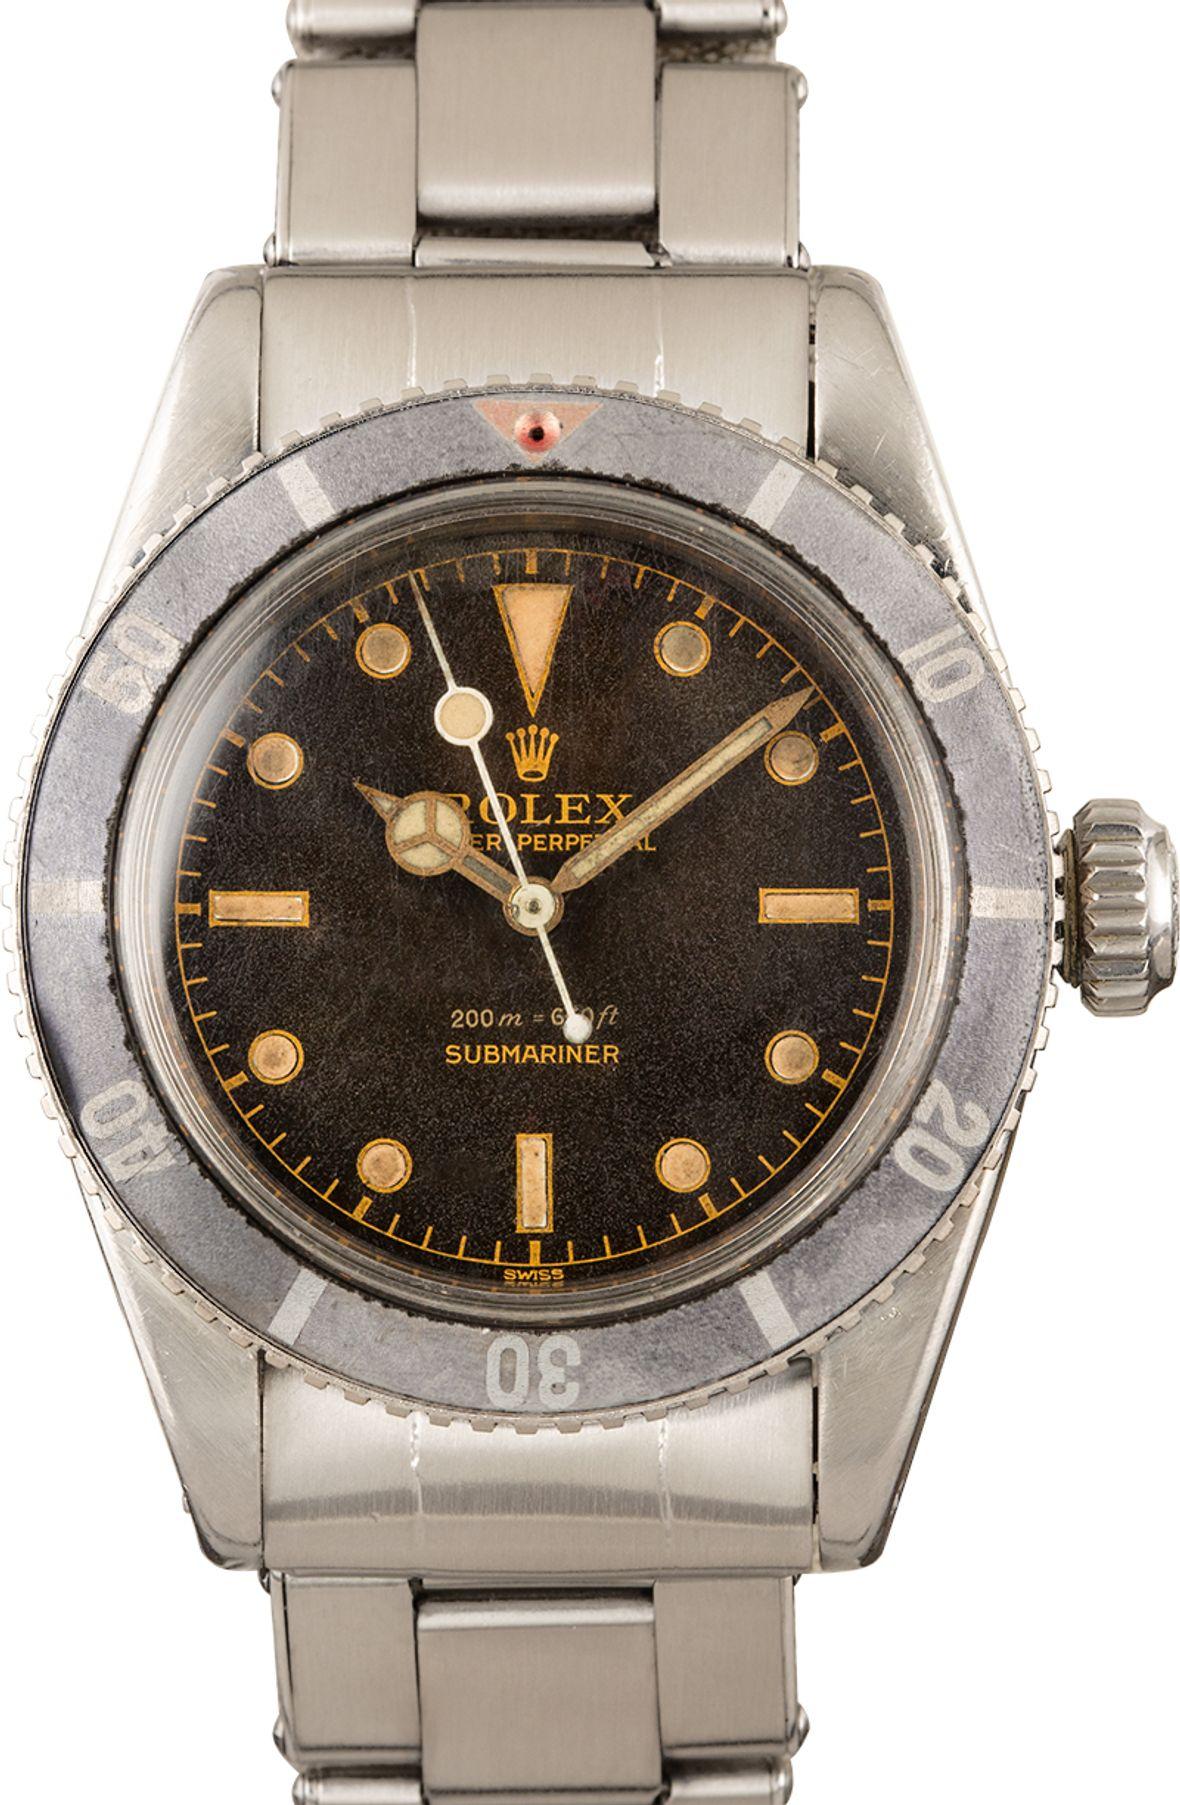 James Bond Rolex Submariner 6538